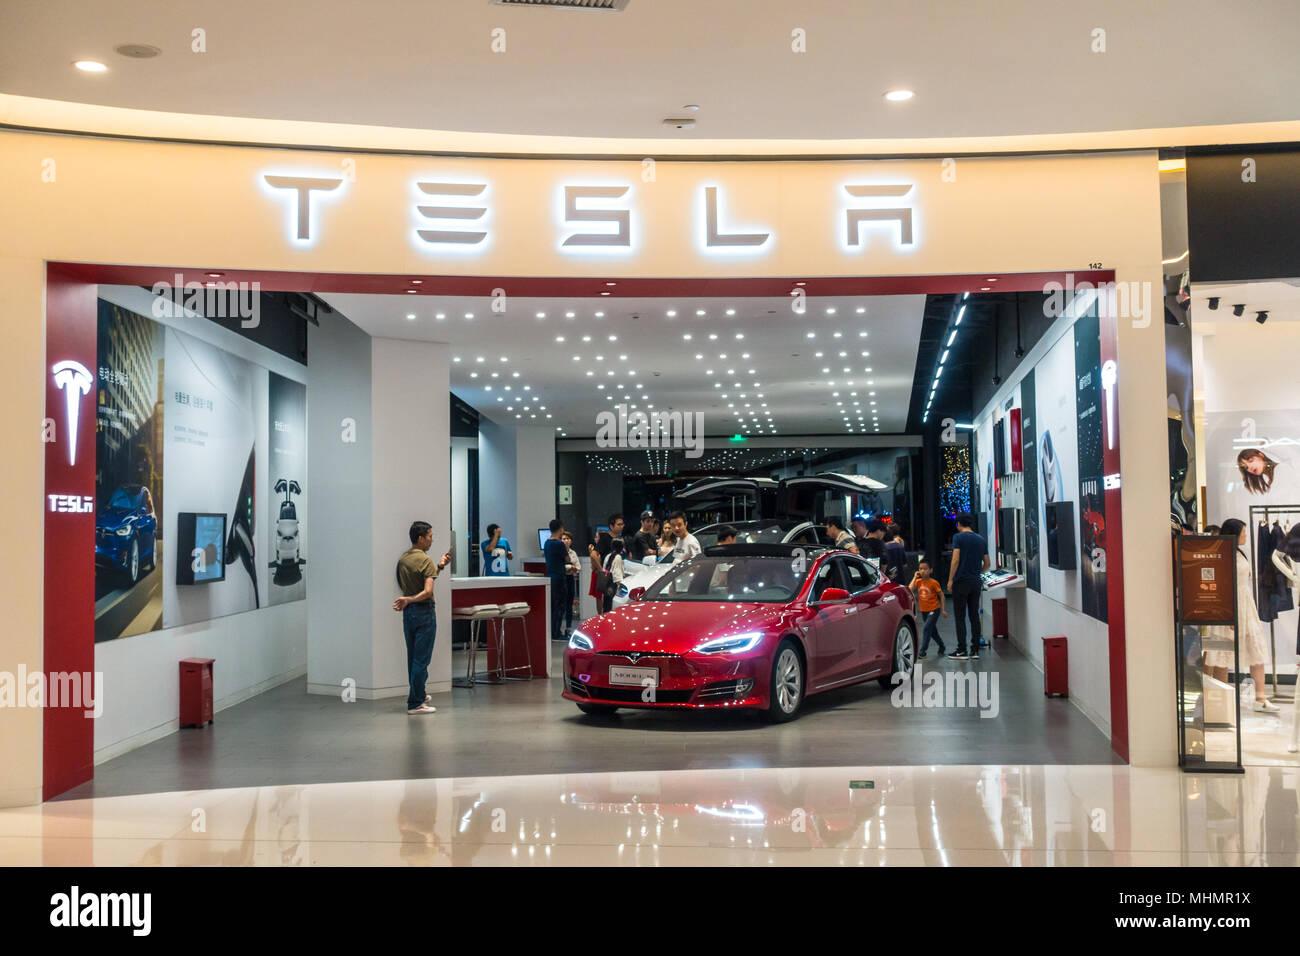 Tesla car dealer in Shenzhen, China - Stock Image